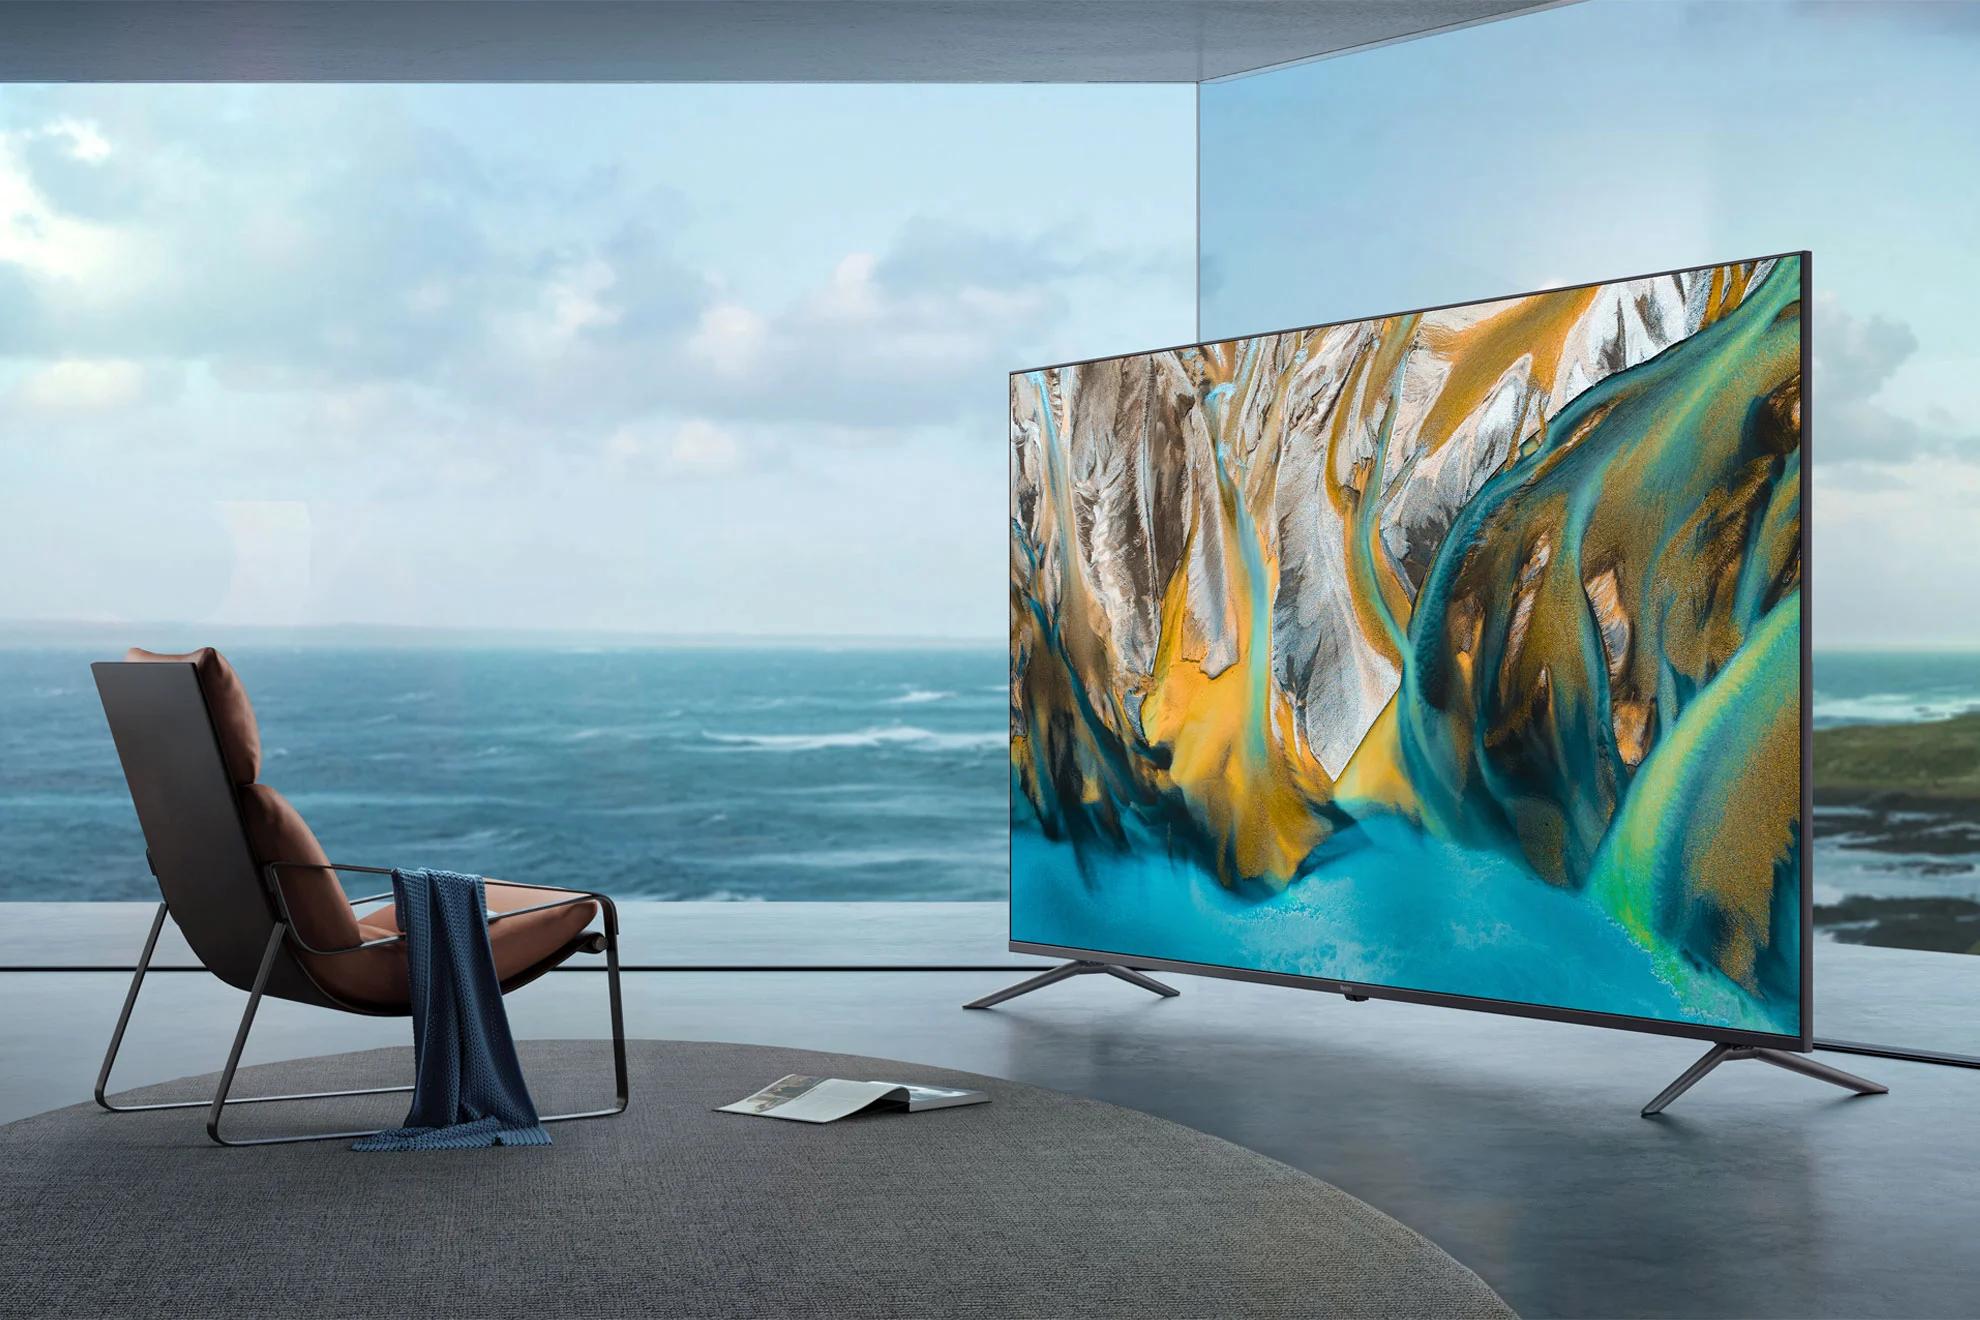 Redmi MAX 86 Smart TV Review: Big Cinema Display at Your Home